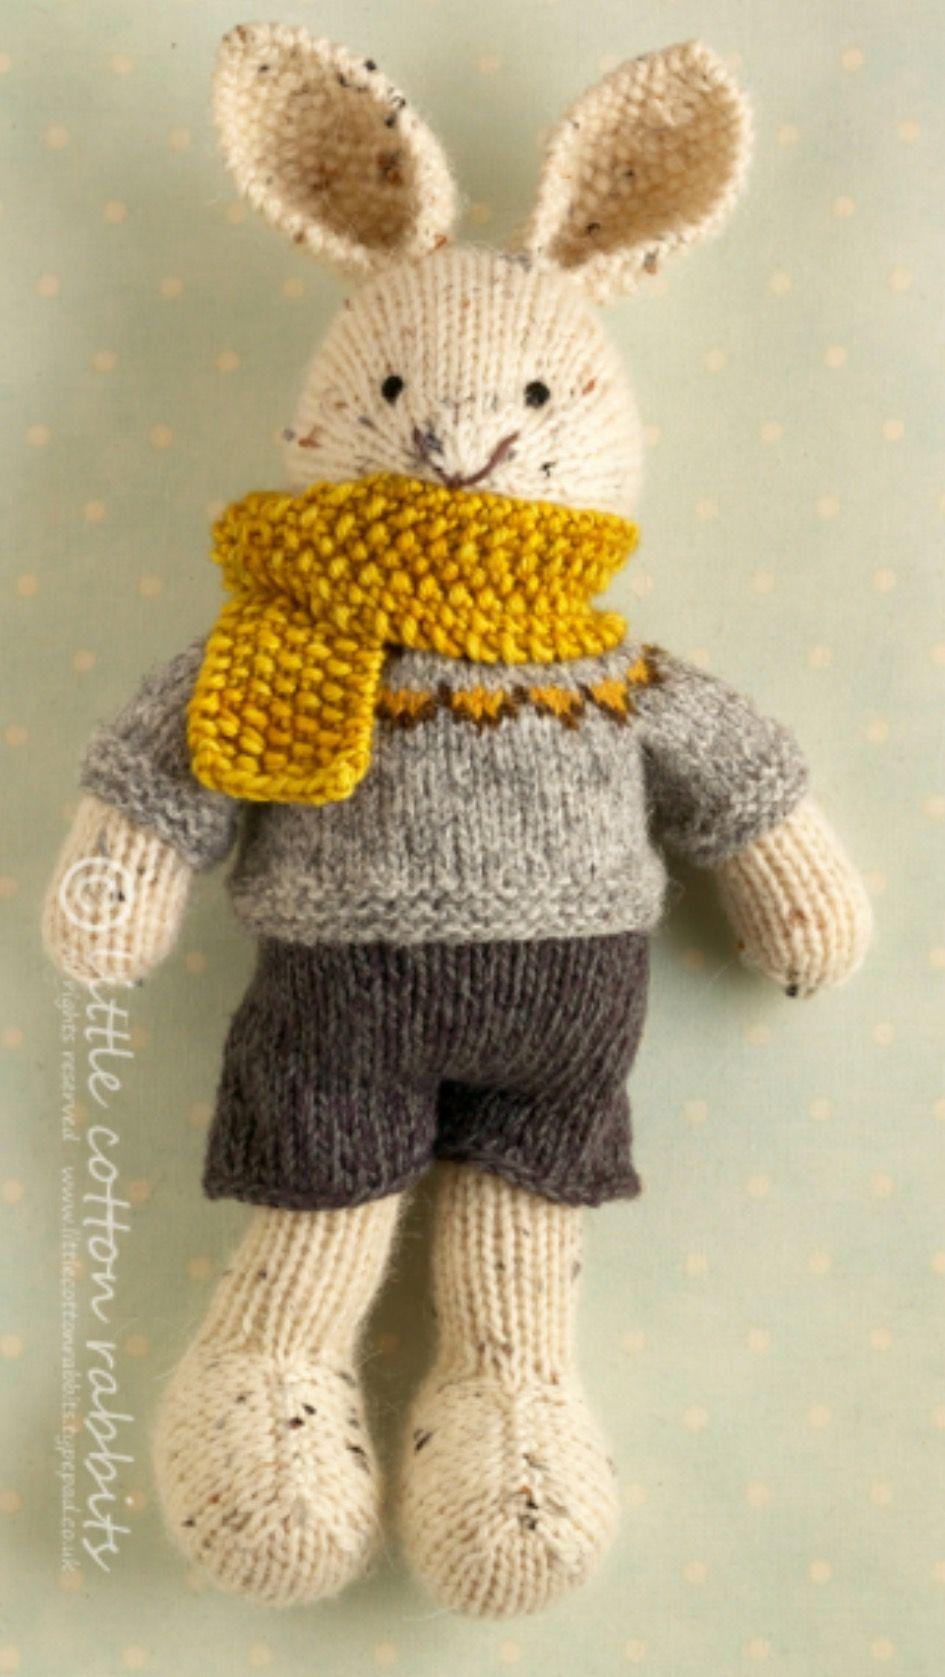 Littlecottonrabbits | Animals to knit and crochet | Pinterest ...